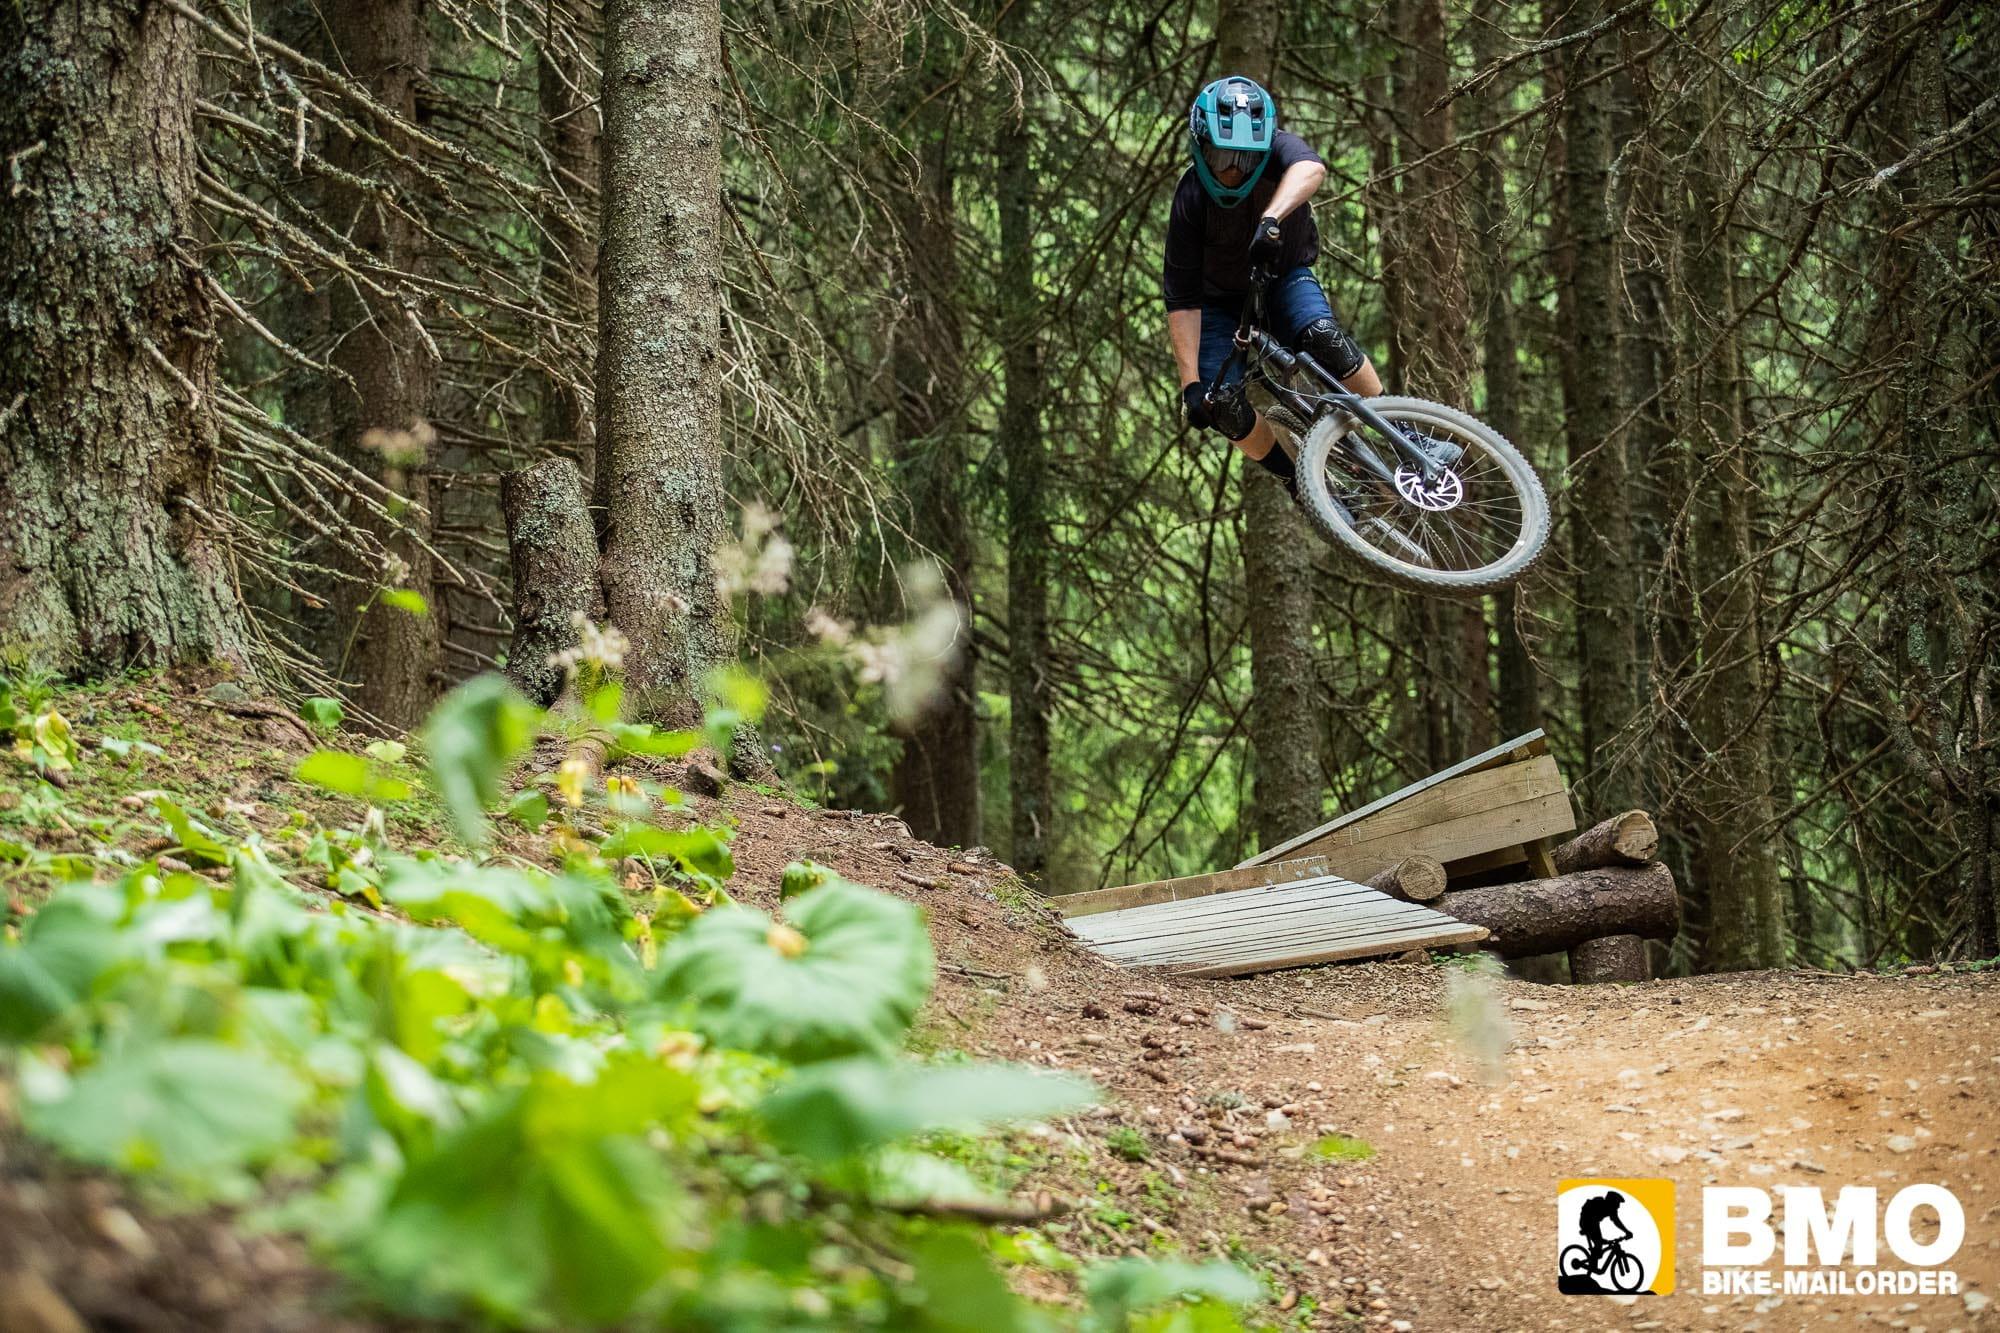 BMO-Bike-Mailorder-Lenzerheide-Home-of-Trails-7